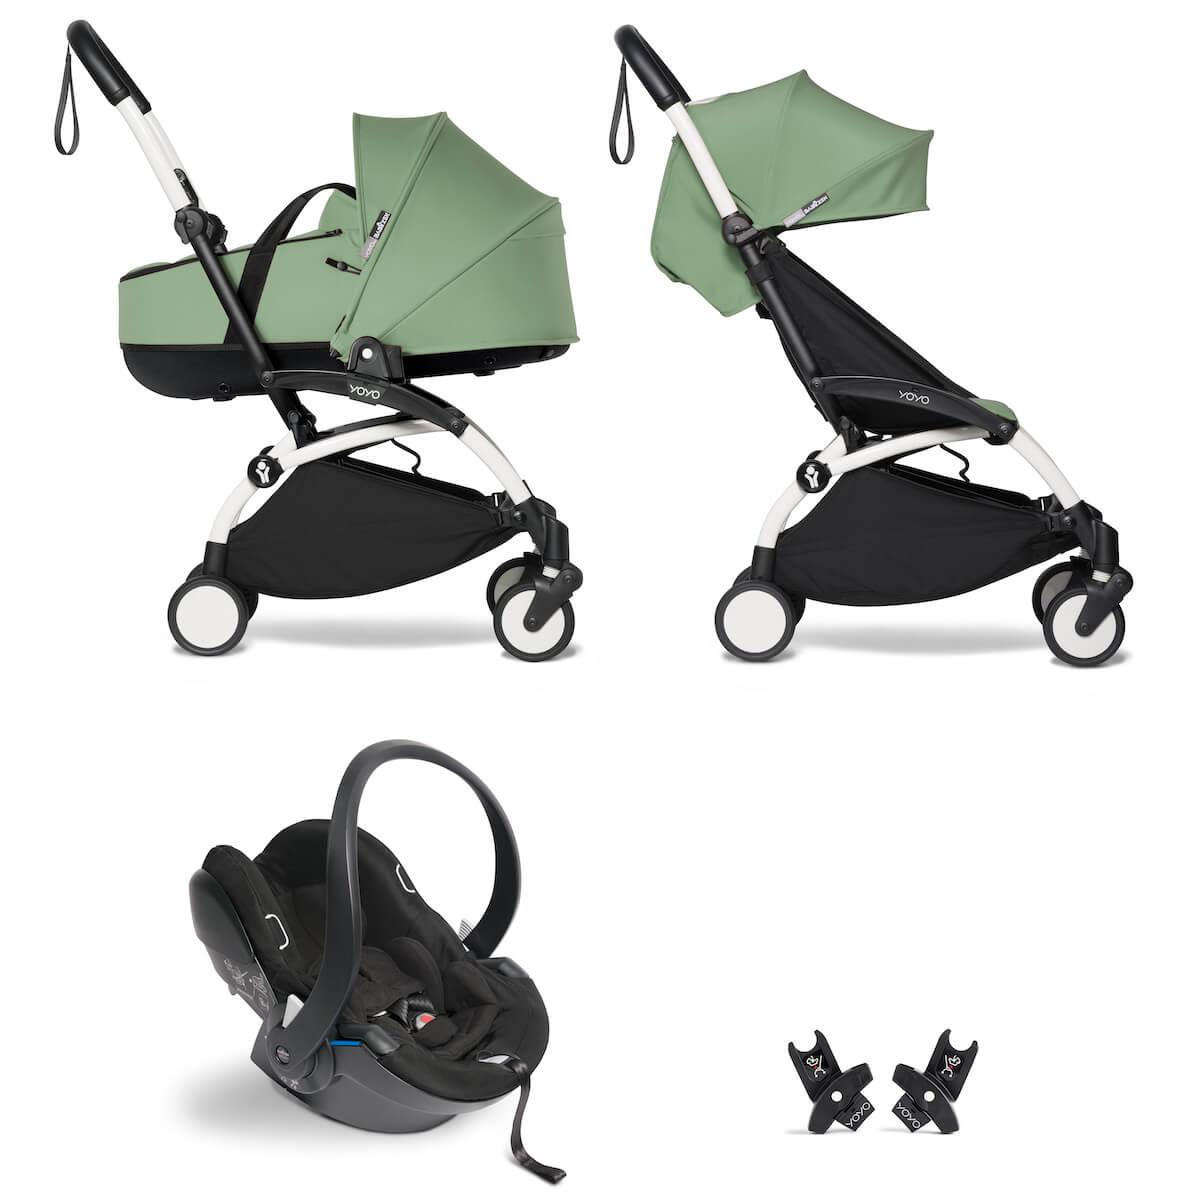 Kinderwagen BABYZEN YOYO²  all-in-one Wanne/Autositz/6+ weiß-peppermint